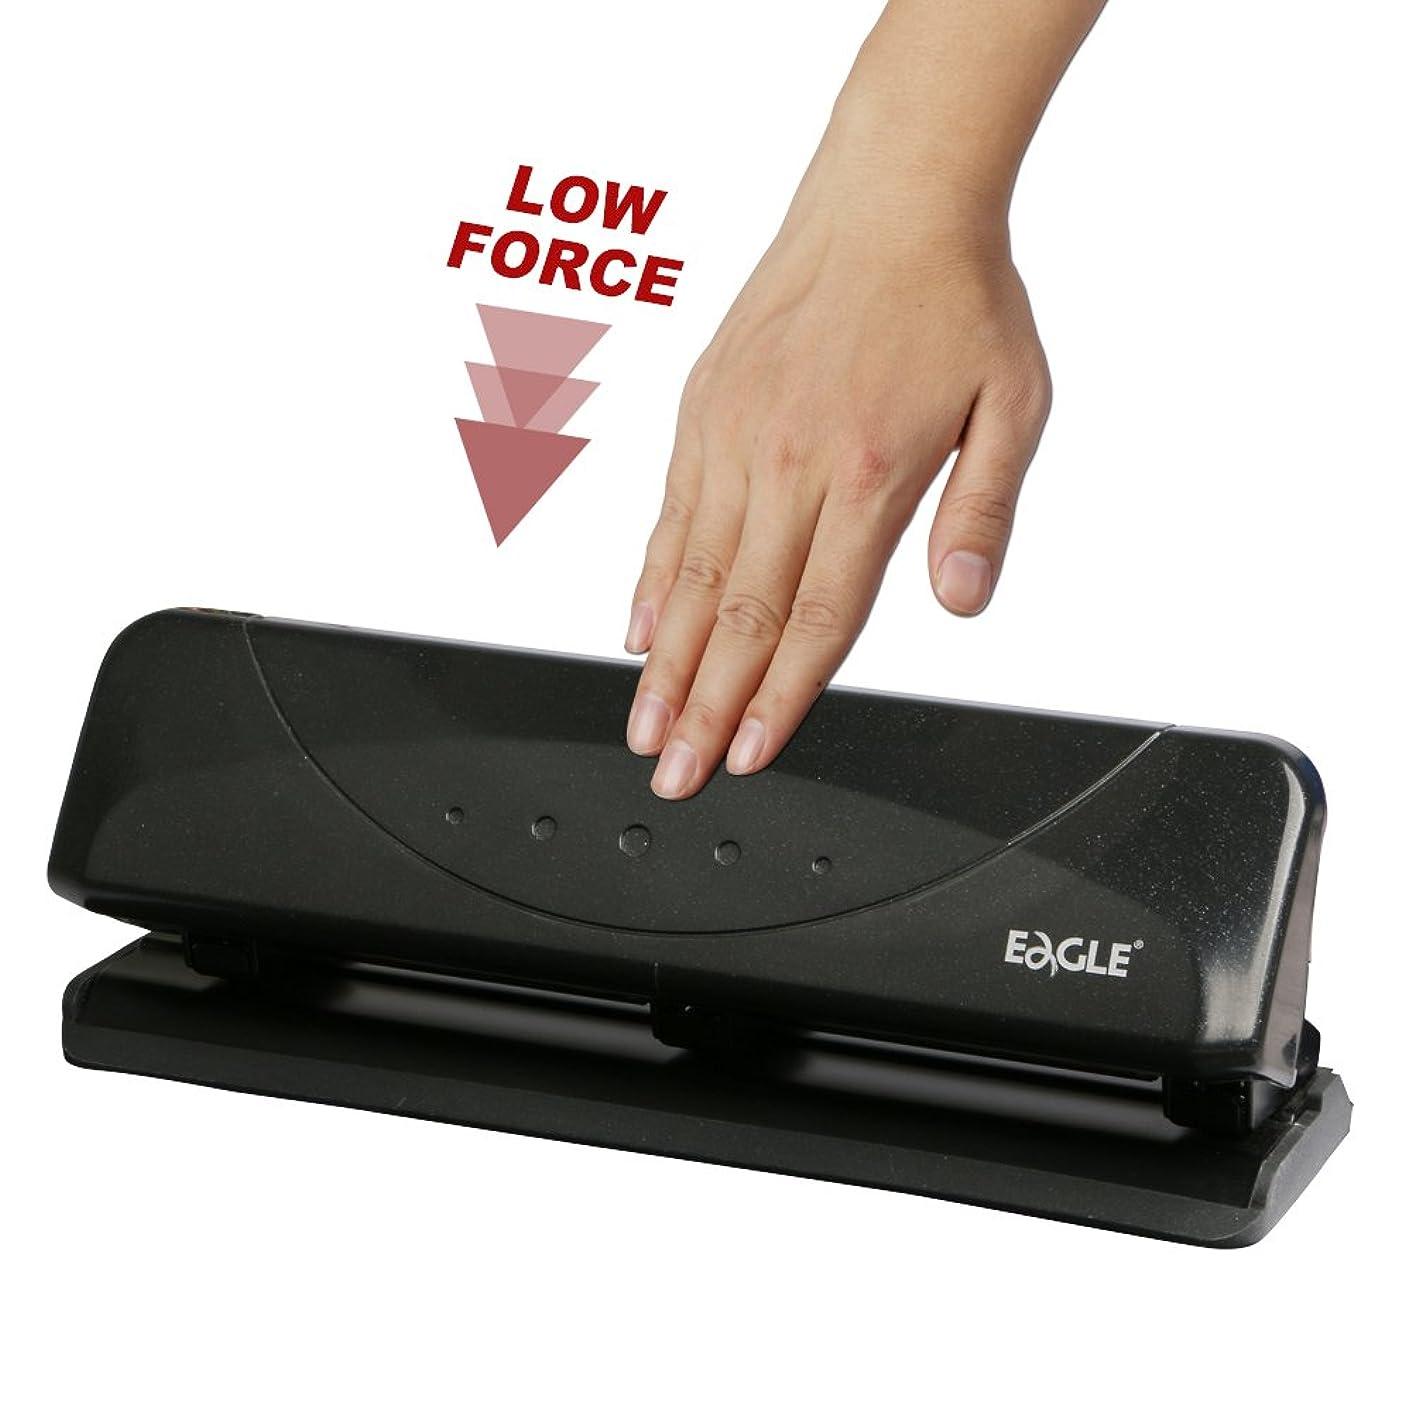 Eagle Desktop 3-Hole Punch,?Low Force,?20 Sheets Capacity